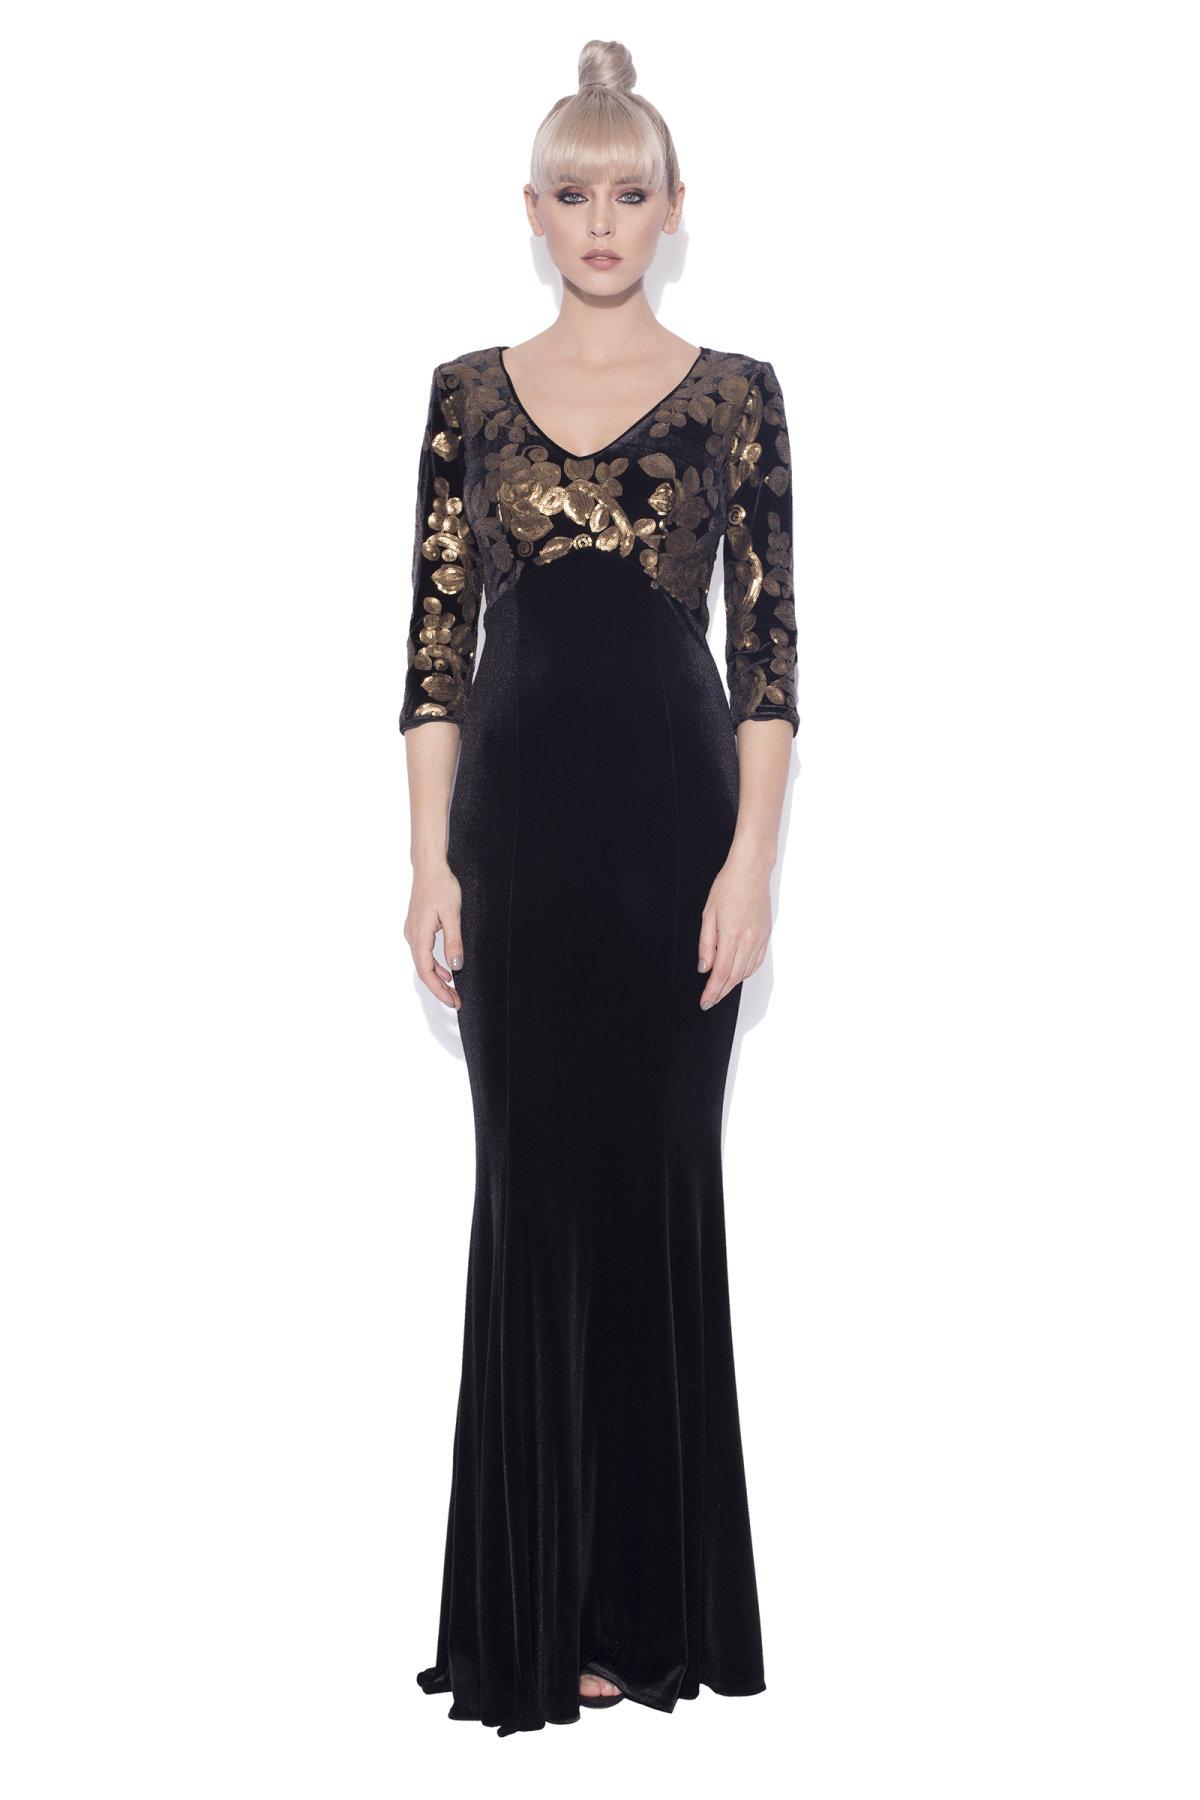 77f91b3e8a8d7 Velvet dress with sequin detail | rs9935 | NISSA